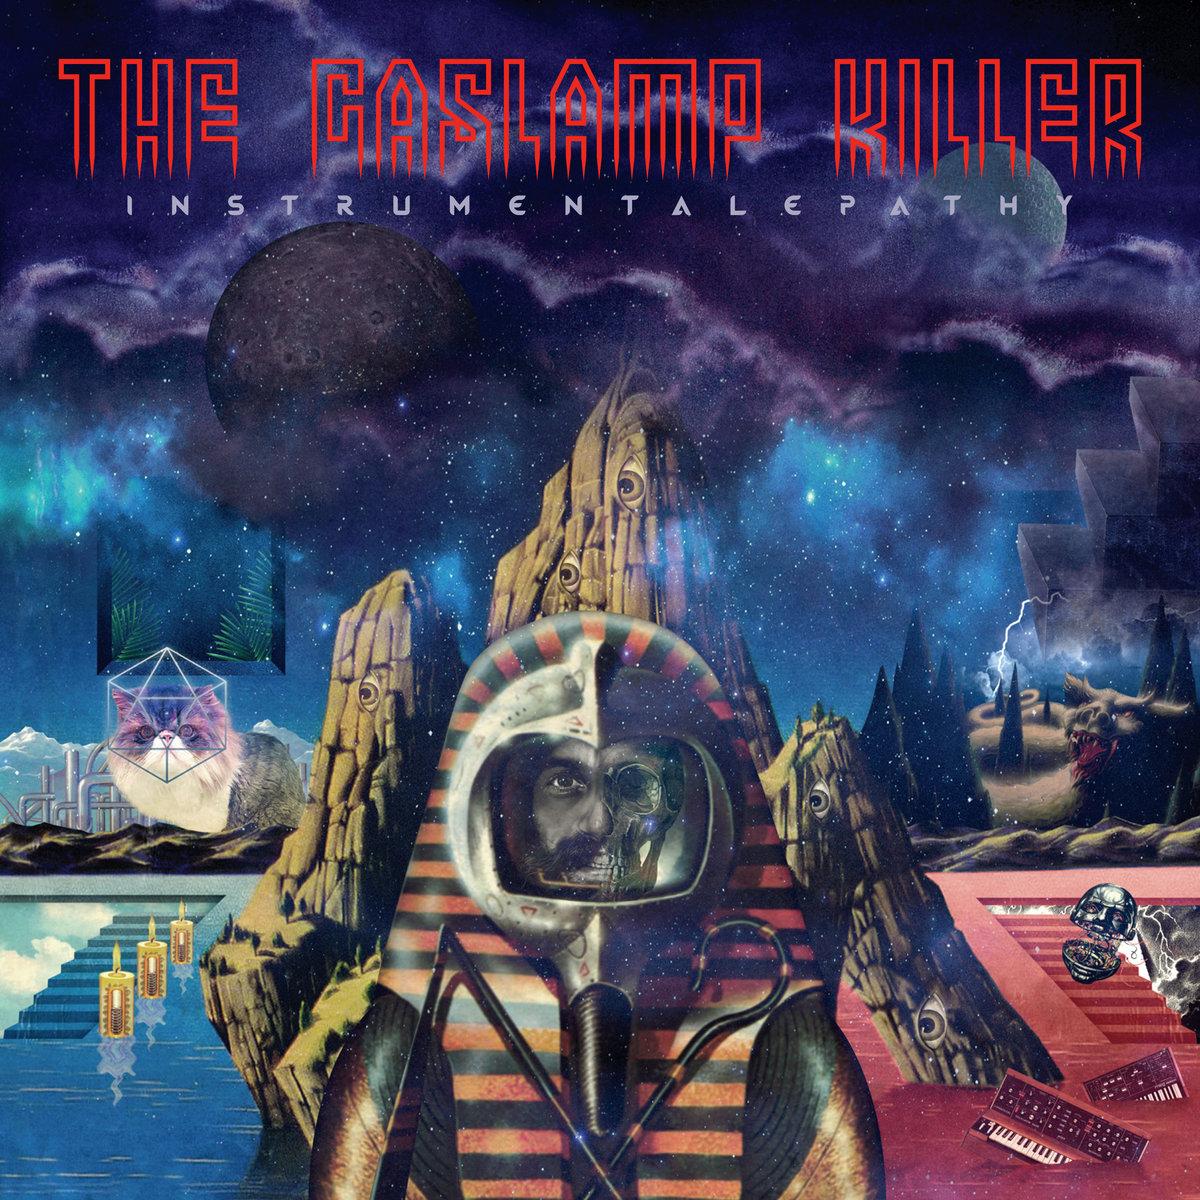 Future Classic The Gaslamp Killer Quot Instrumentalepathy